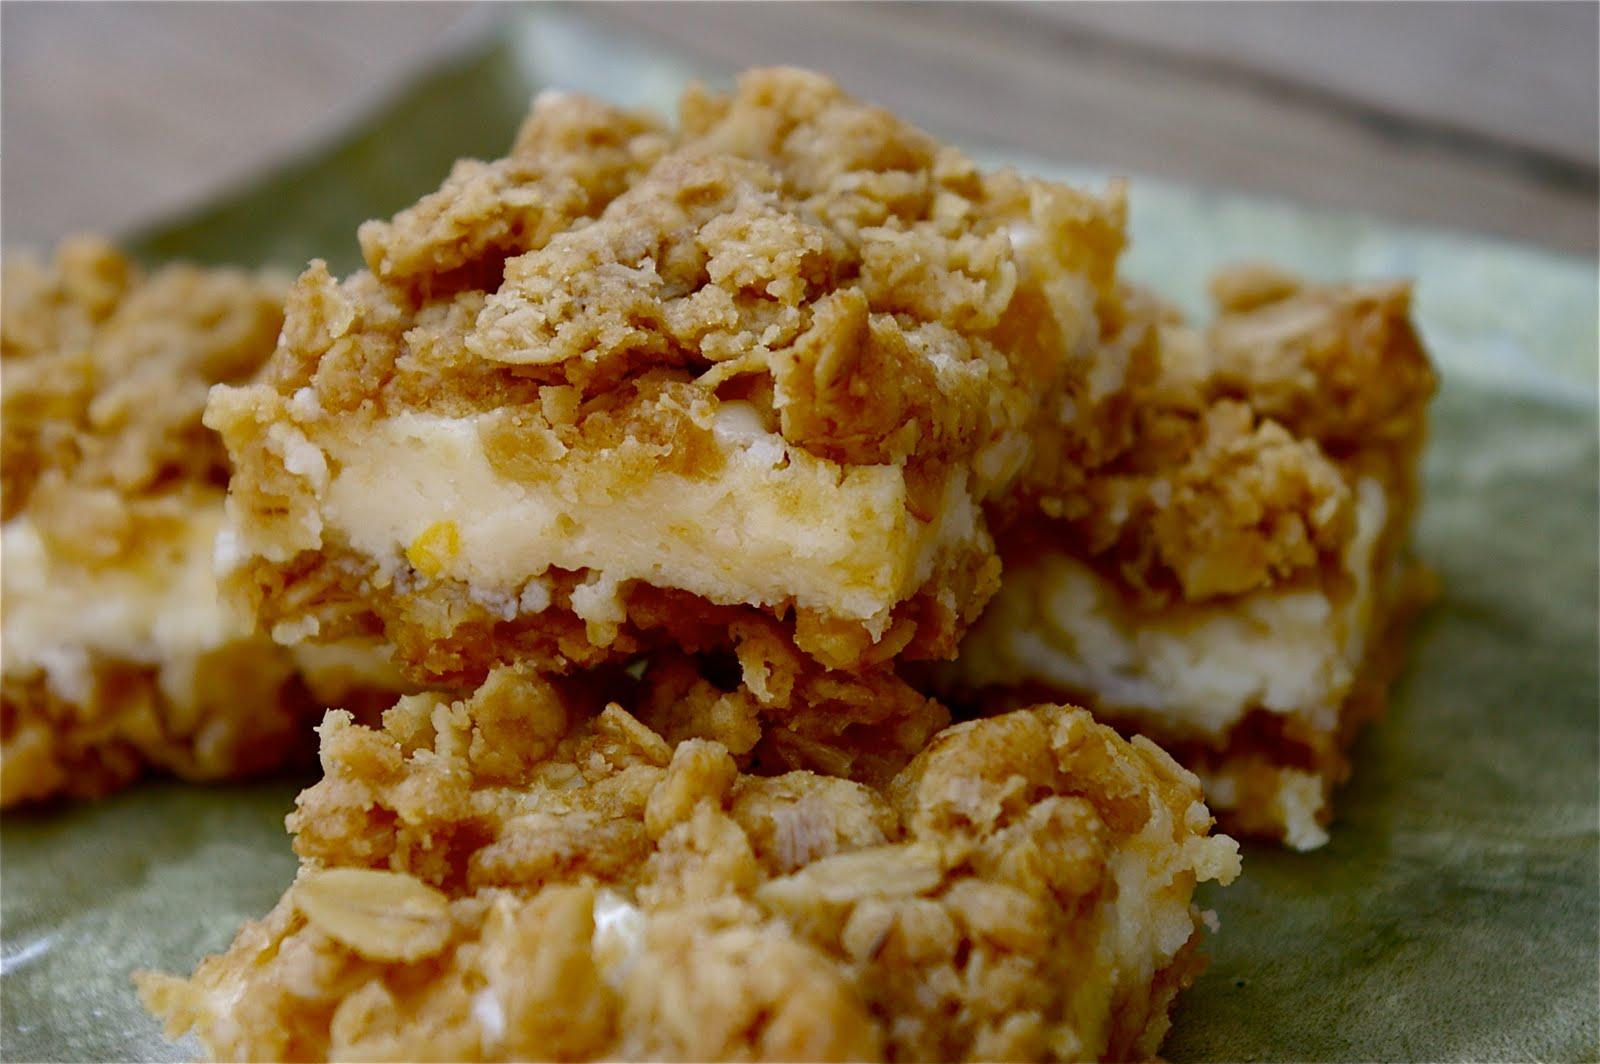 Blue Ridge Baker: Creamy Meyer Lemon Crumb Bars